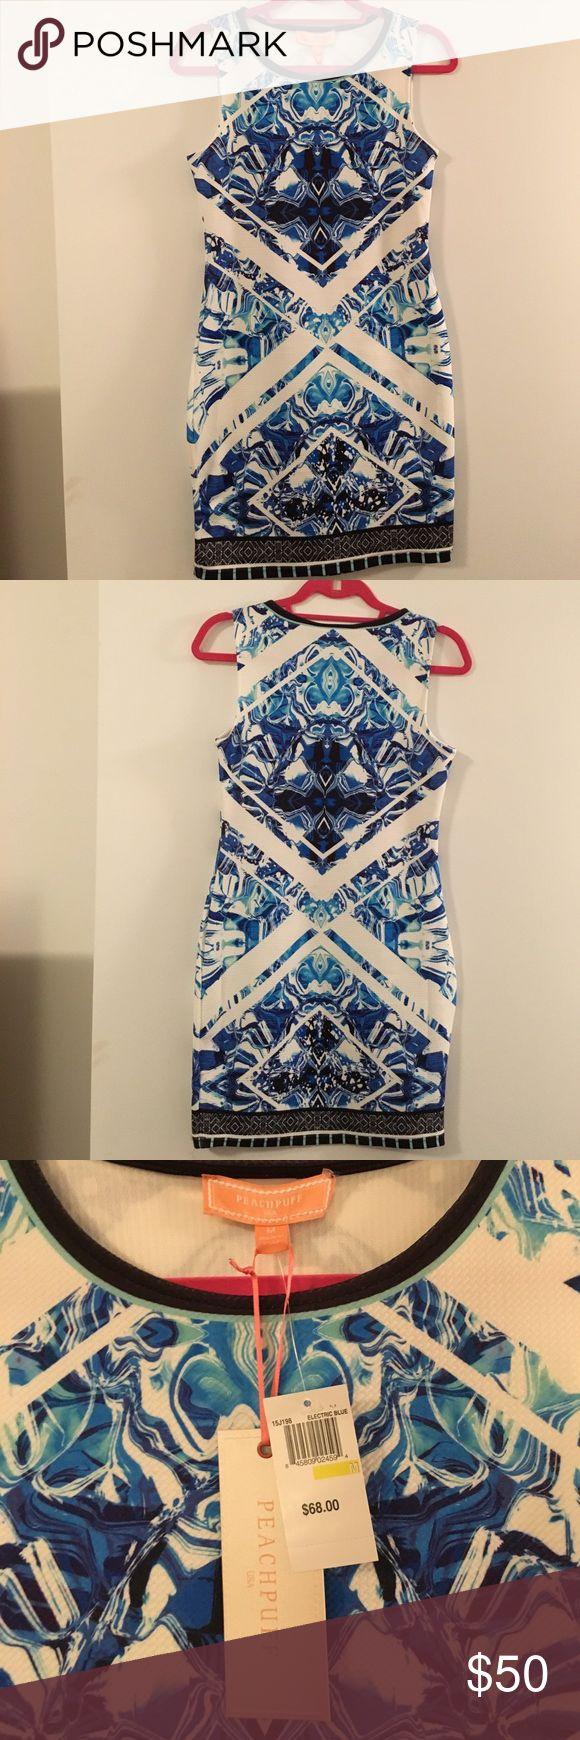 Blue and White Bodycon Mini Dress NEVER WORN blue and white design bodycon dress. Very slimming design ! PEACHPUFF Dresses Mini